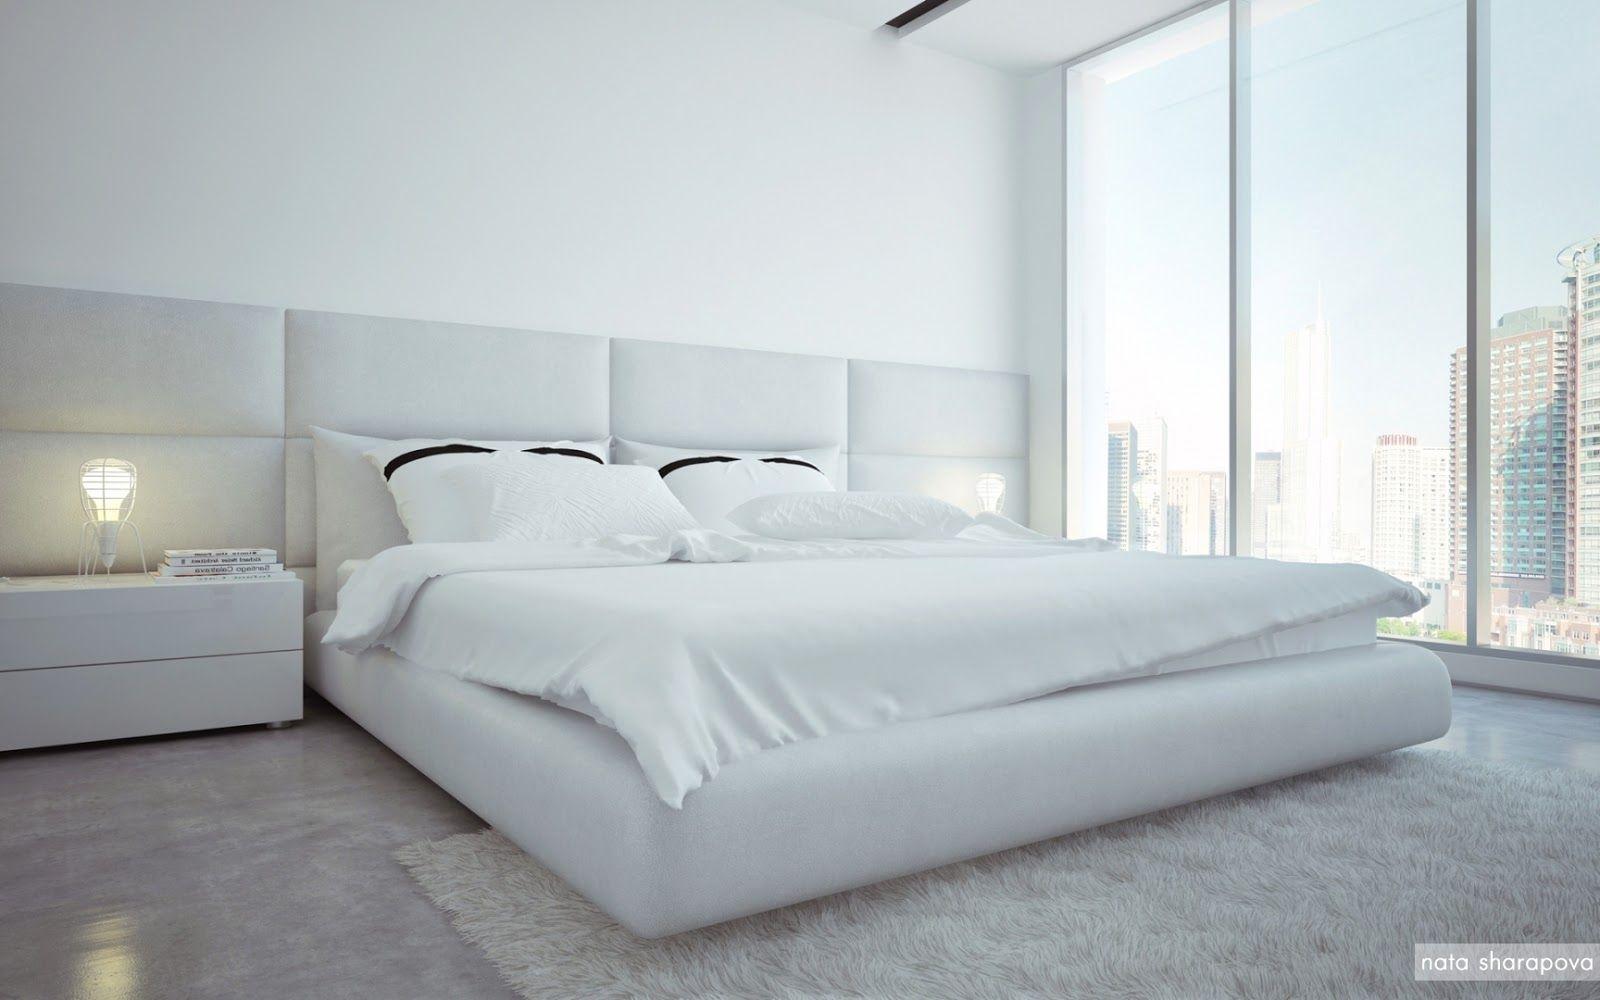 Recamaras blancas minimalistas